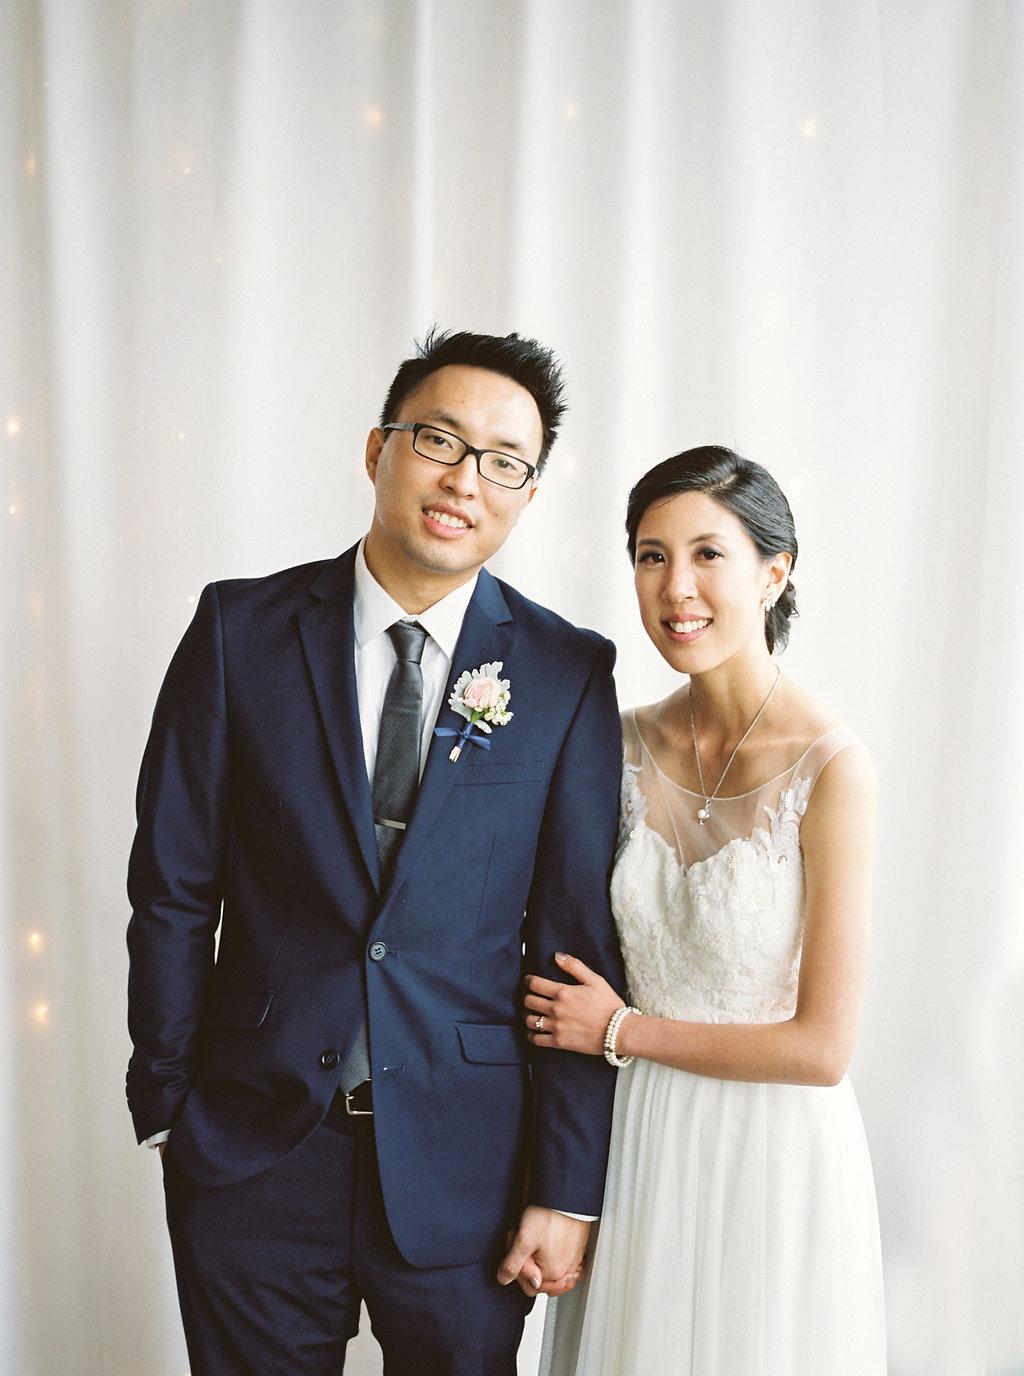 TM_Wedding_663.jpg